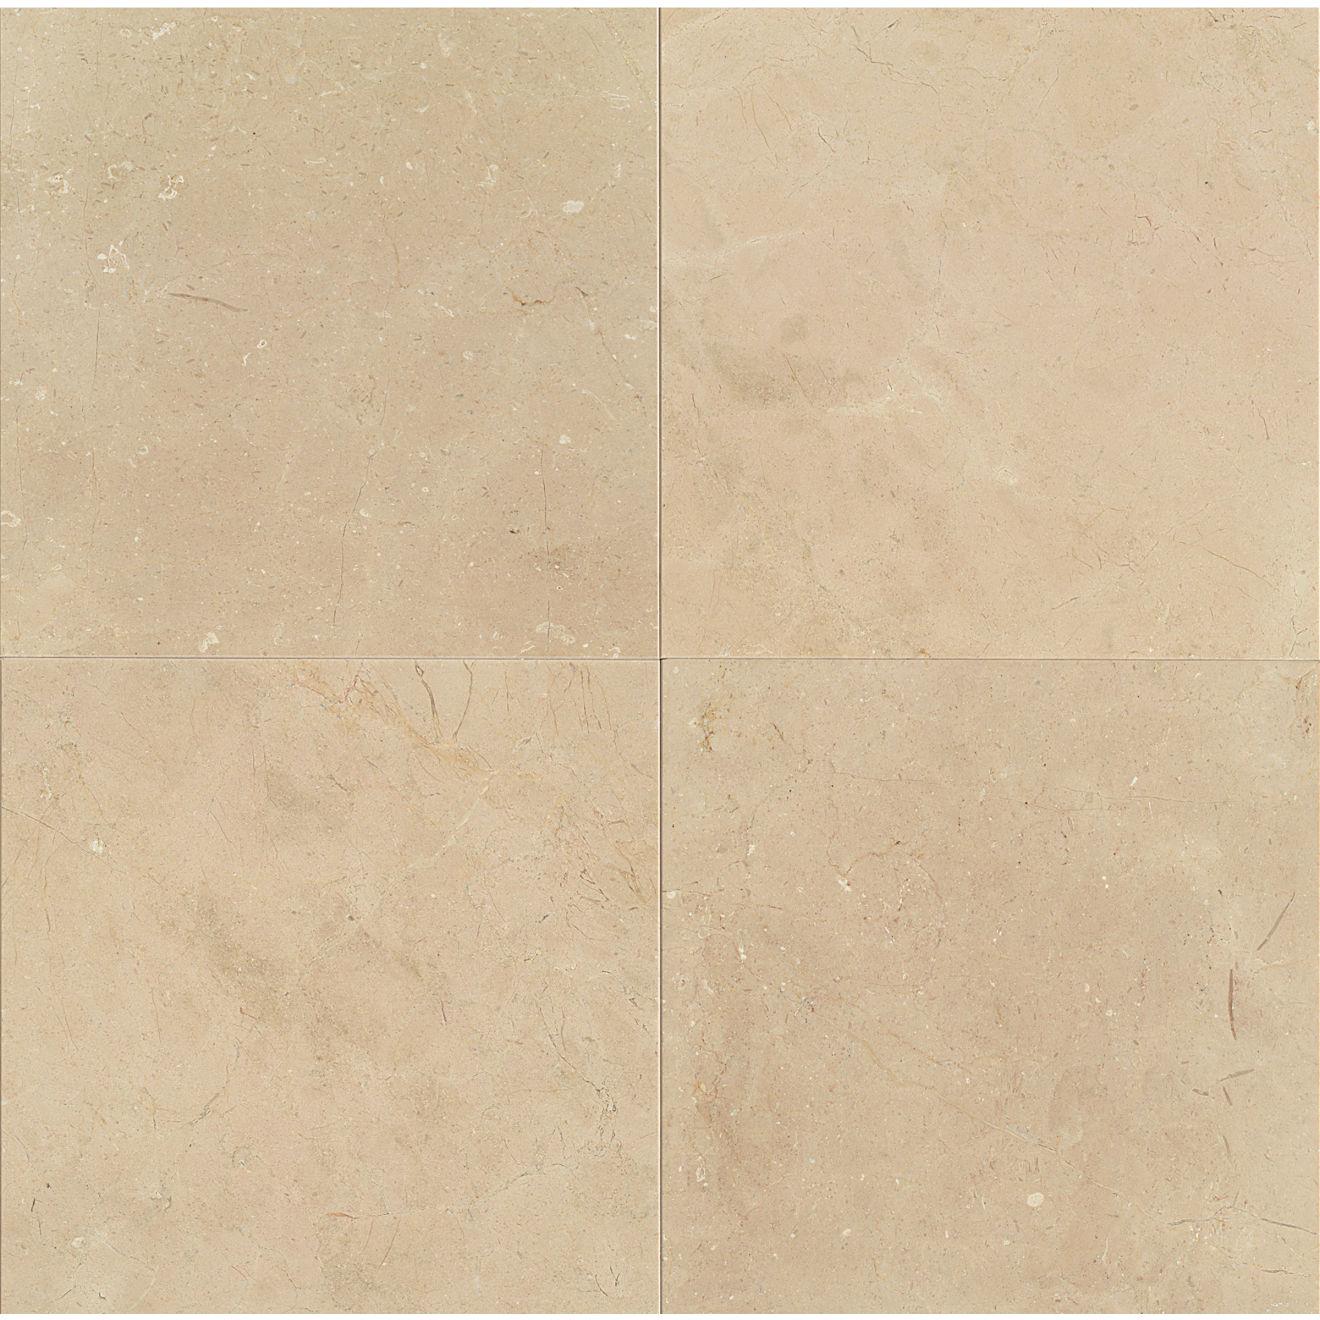 "Crema Marfil Classic 24"" x 24"" Floor & Wall Tile"